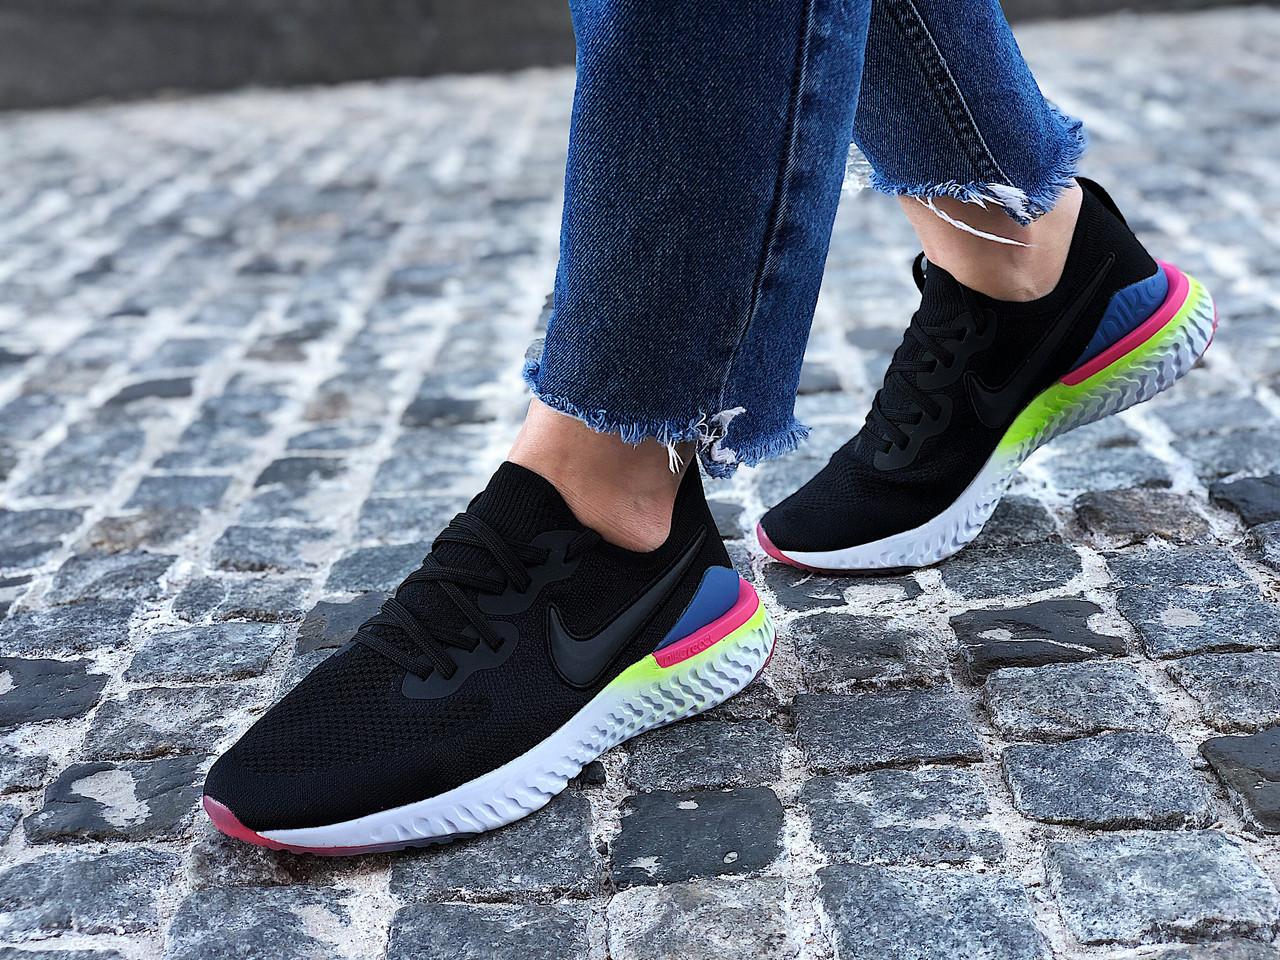 Кросівки жіночі Nike Epic React Flyknit (Розміри:37)